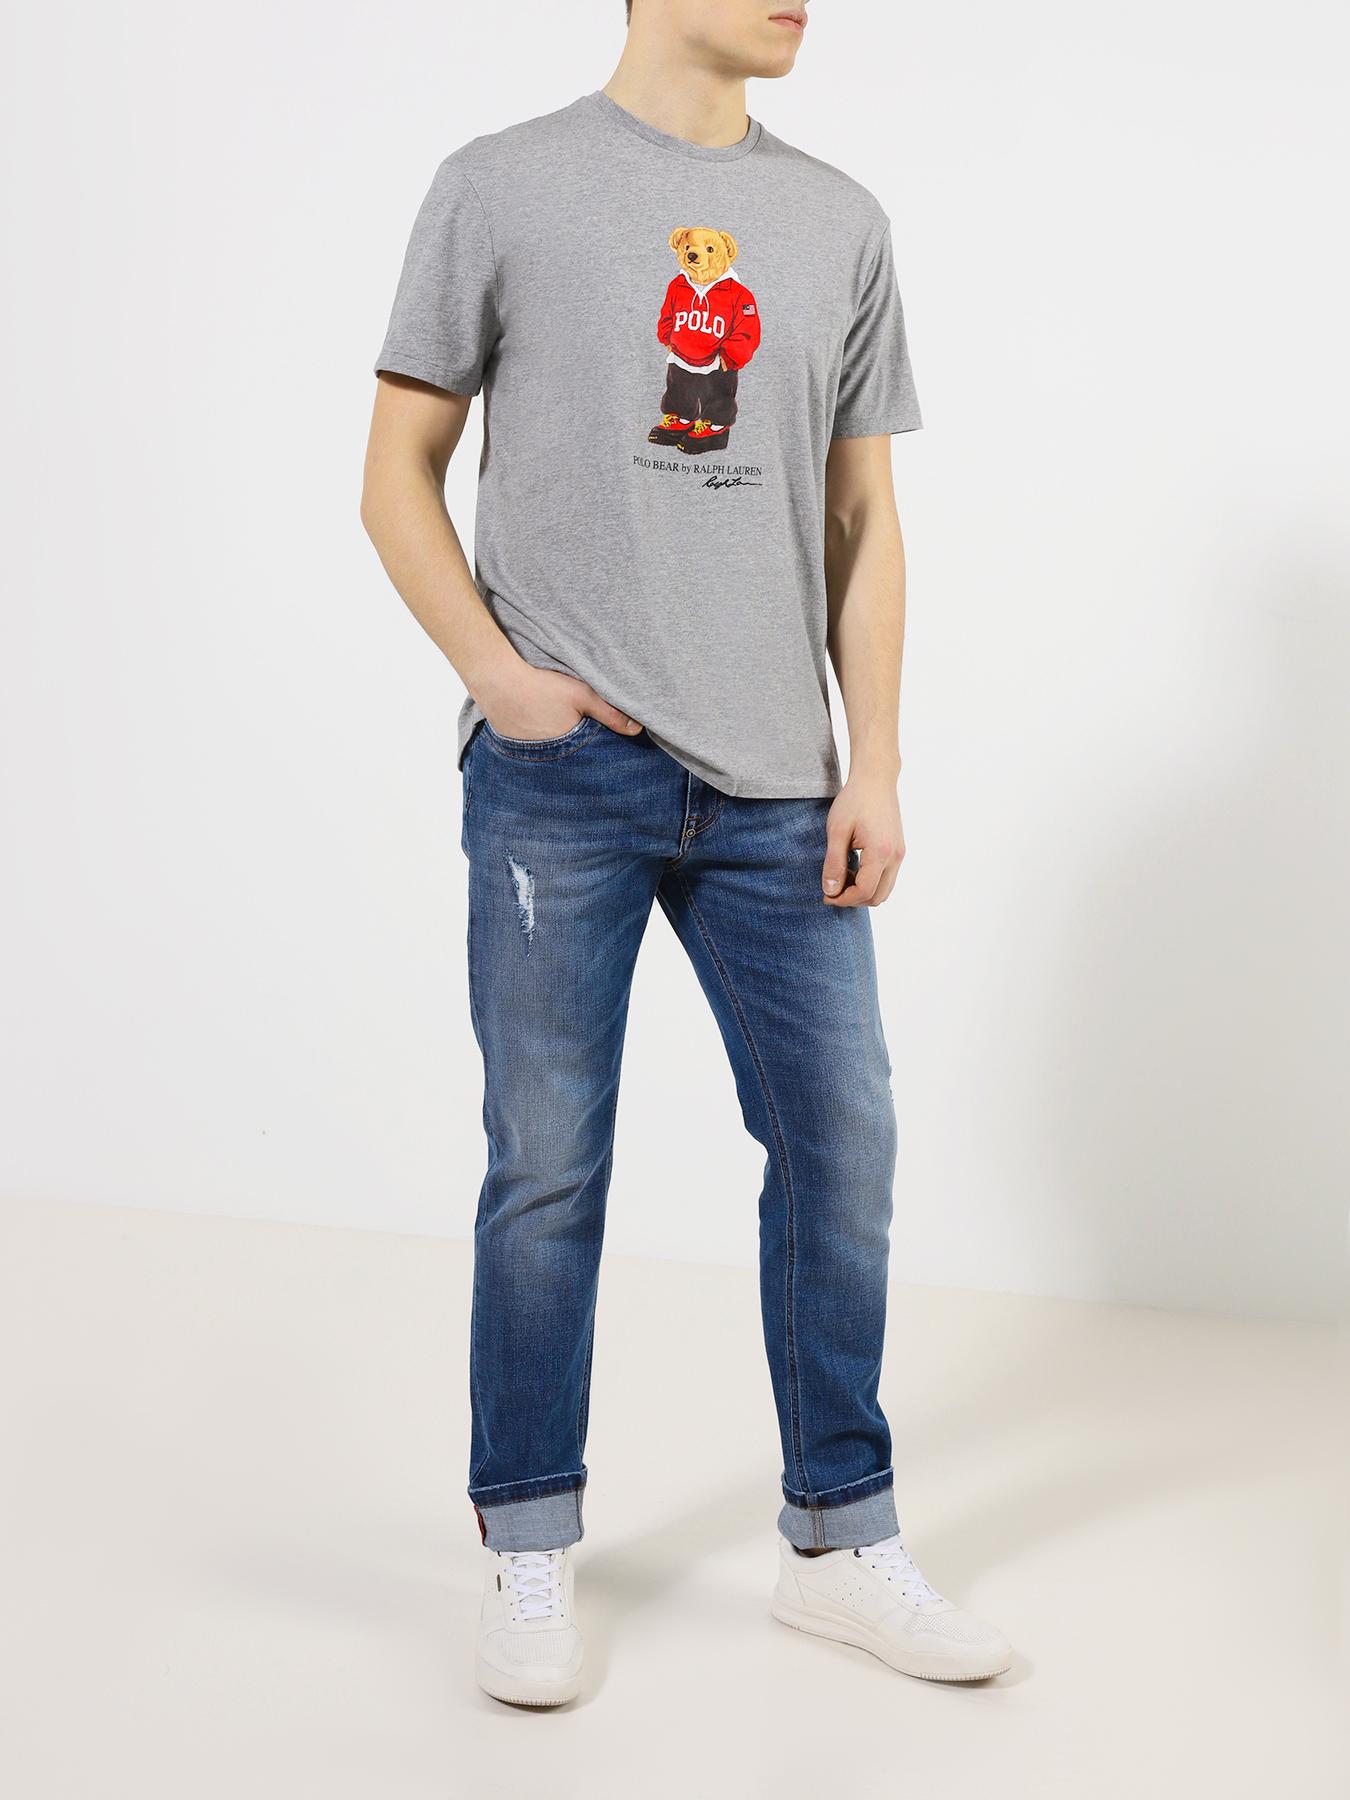 цена на Фуфайка Polo Ralph Lauren Футболка